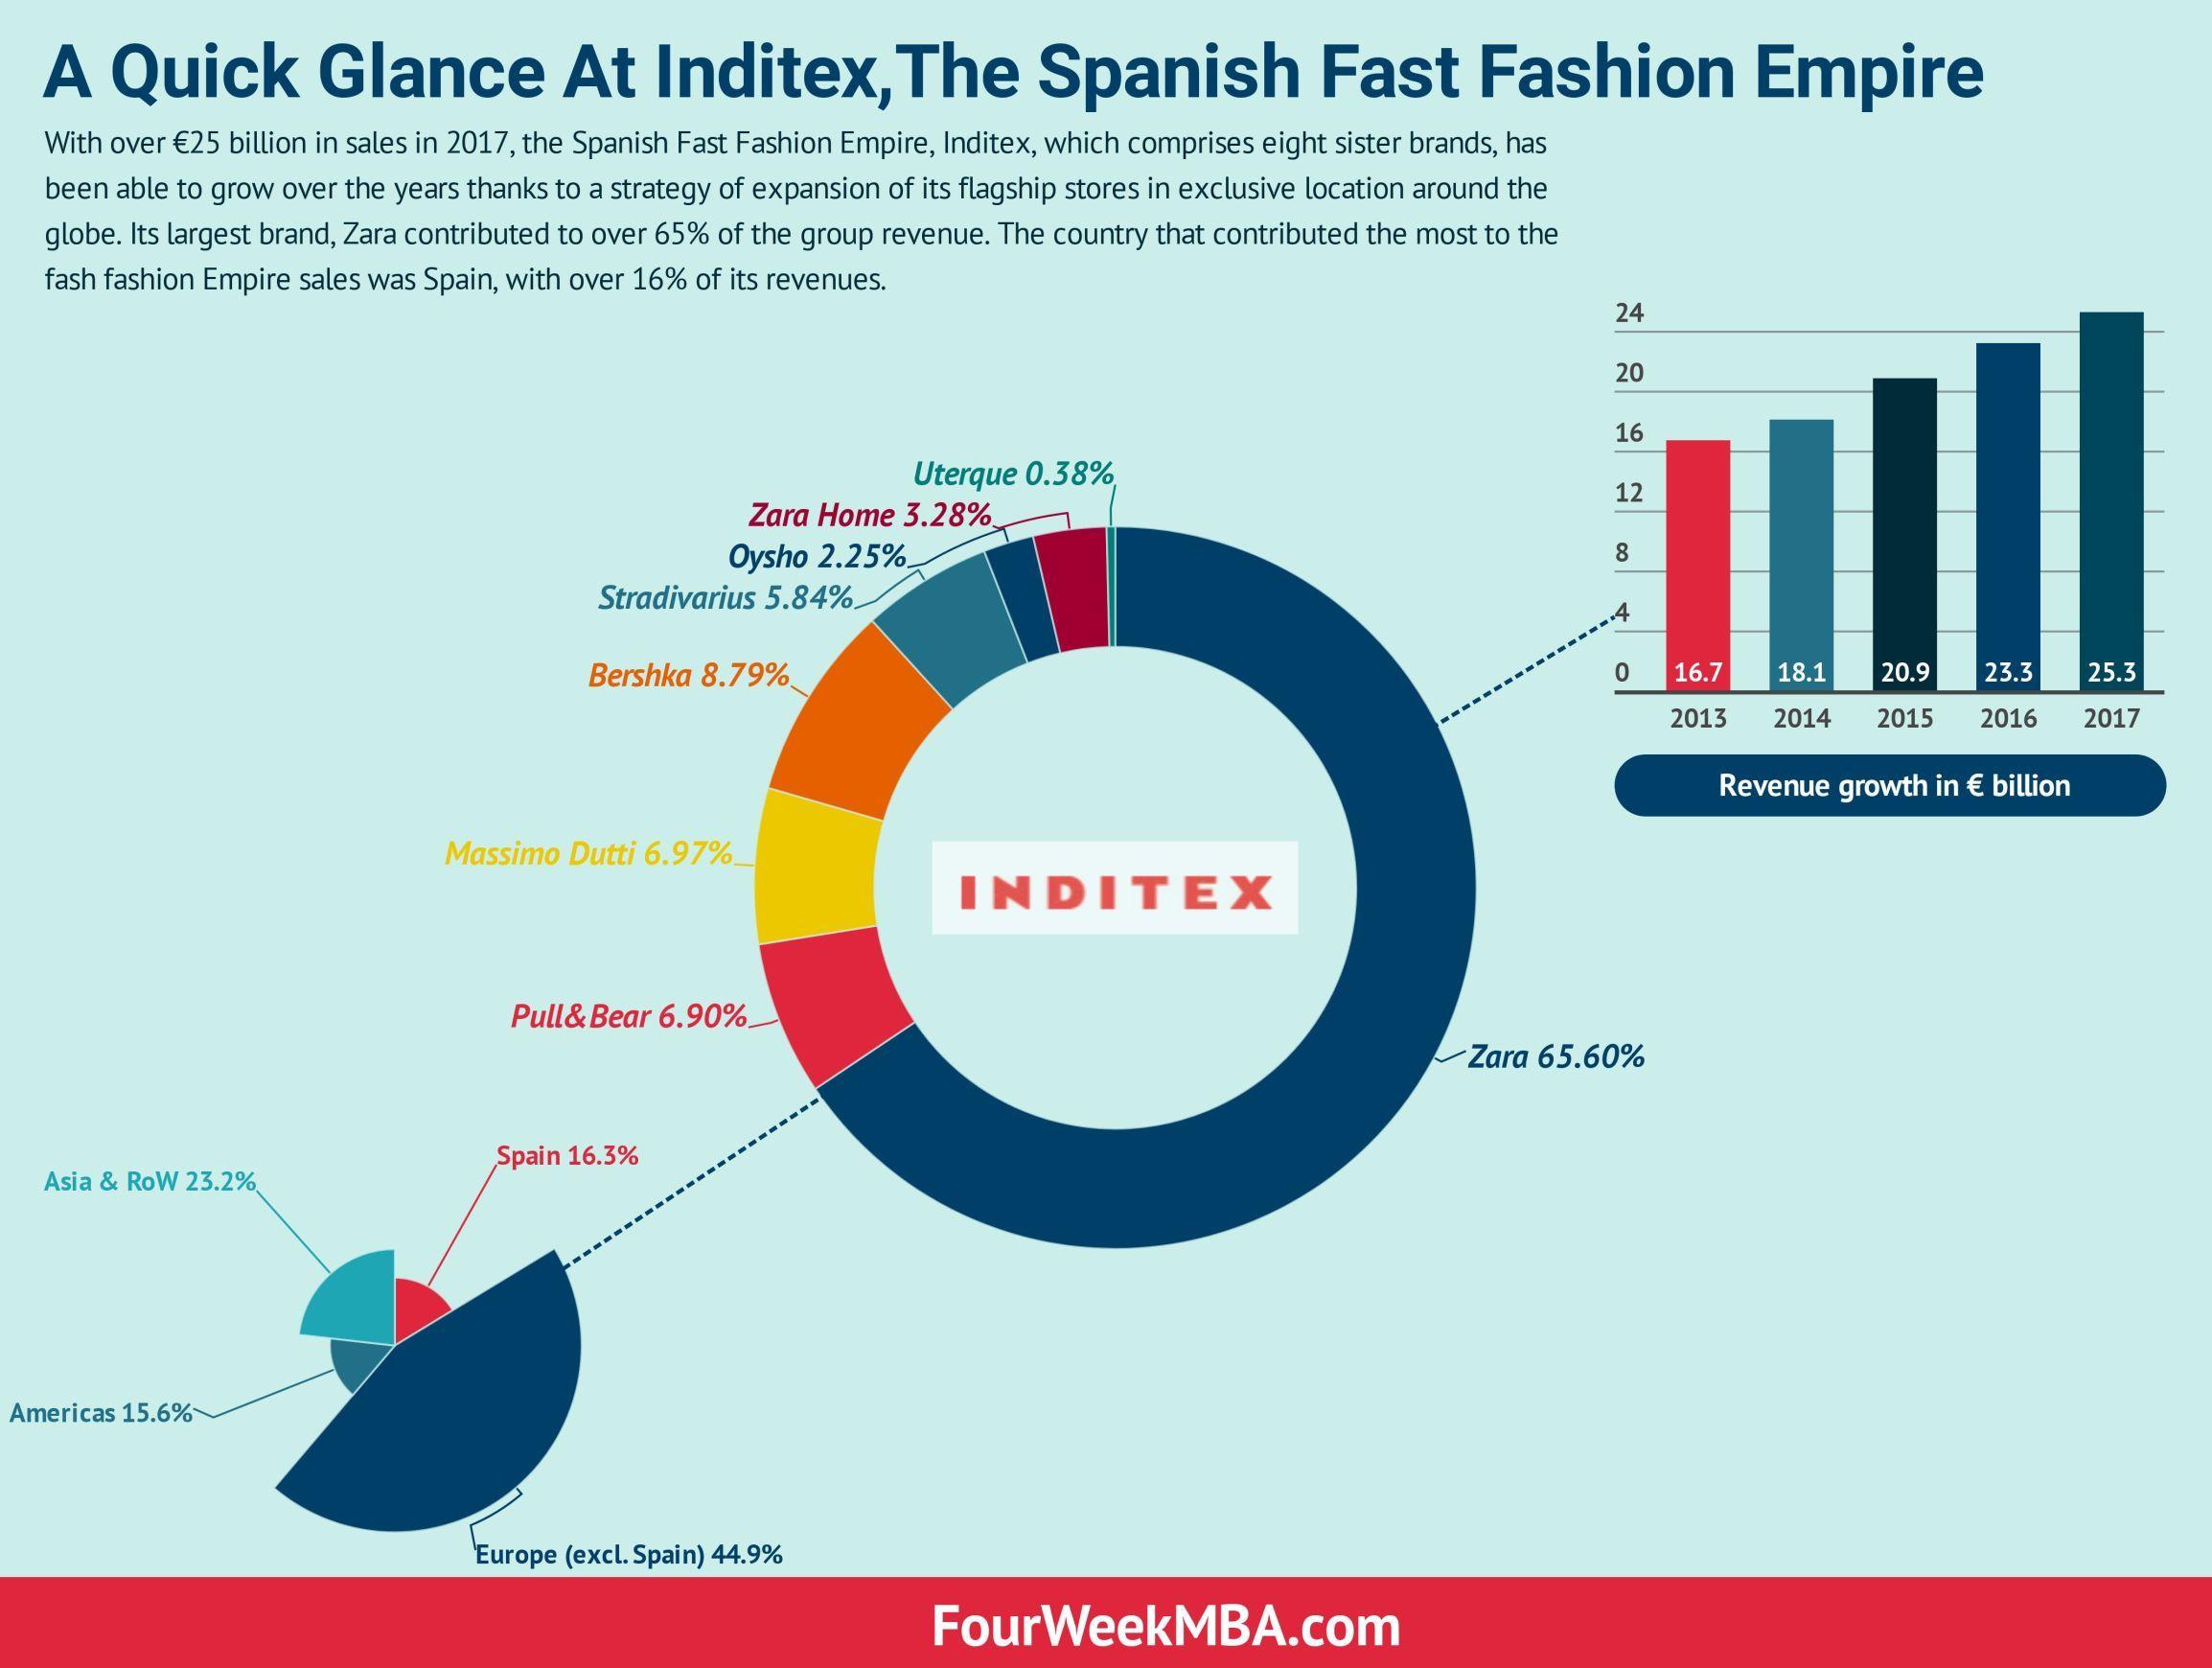 Spanish Fast Fashion Empire